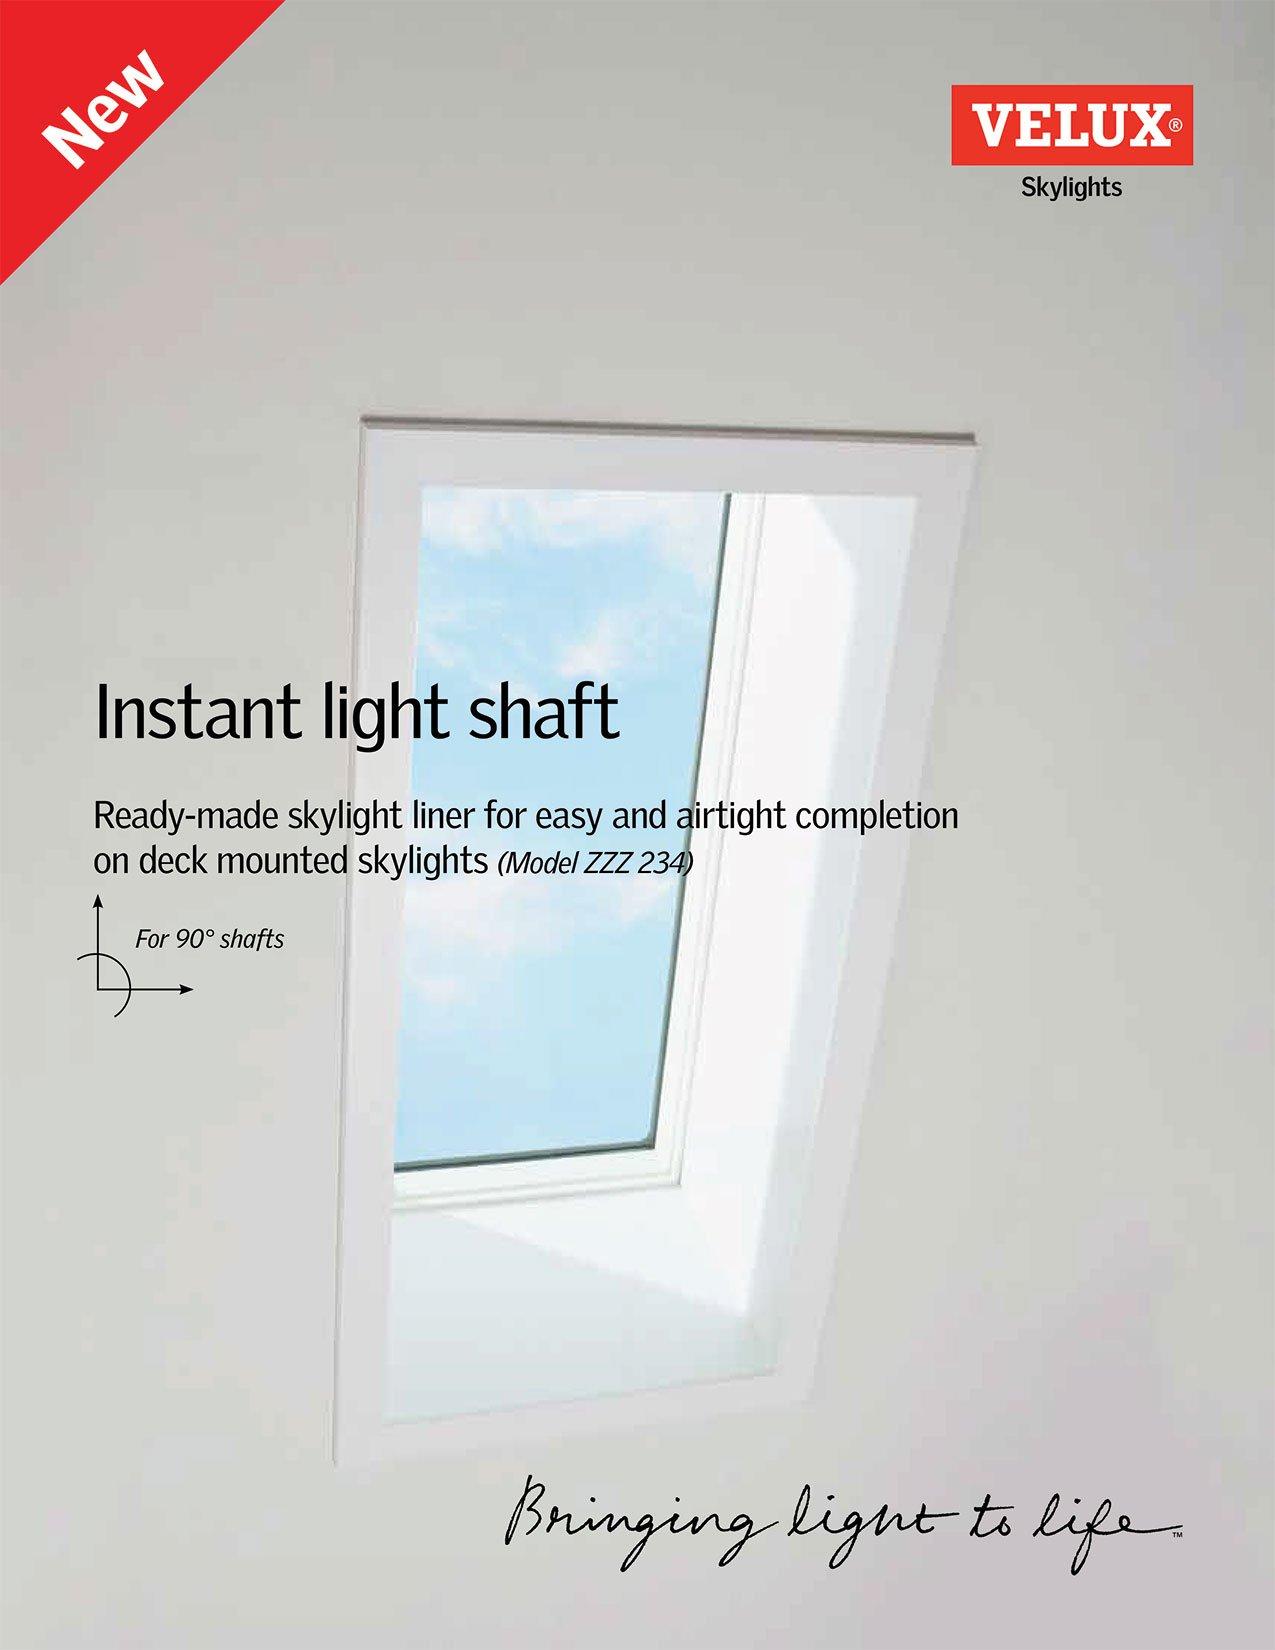 instant-light-shaft-flyer